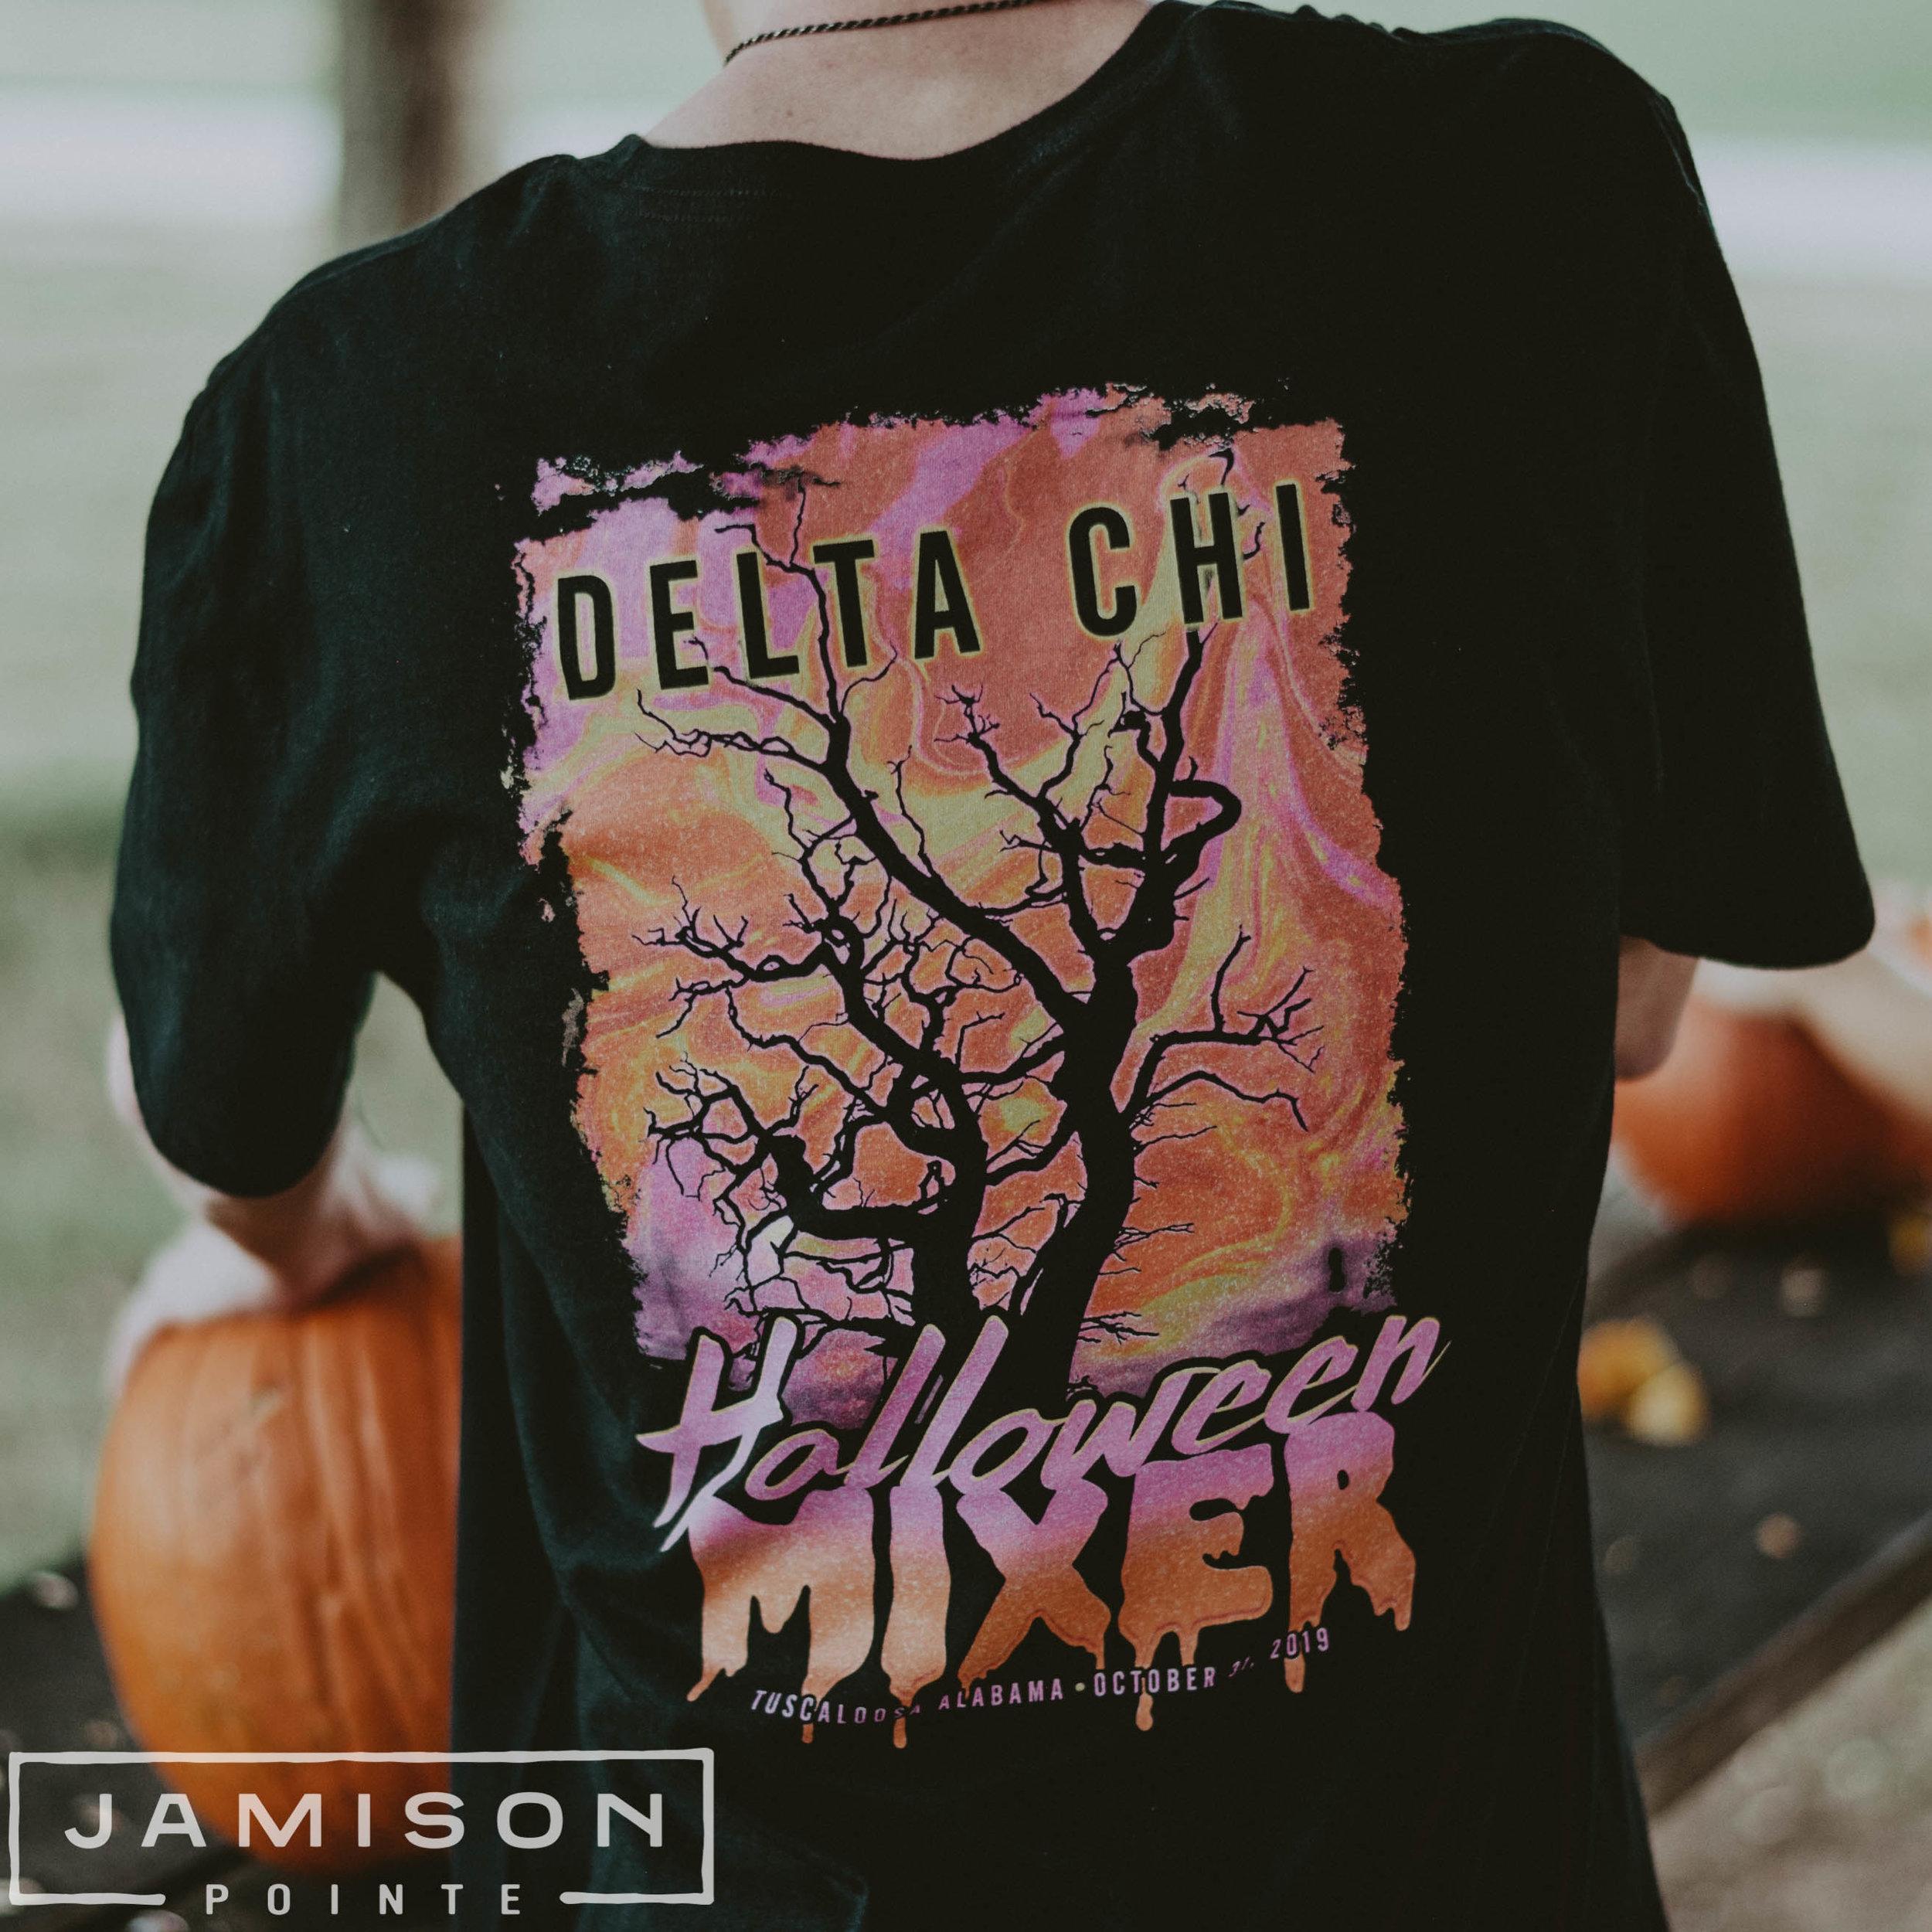 Delta Chi Halloween Mixer Tee